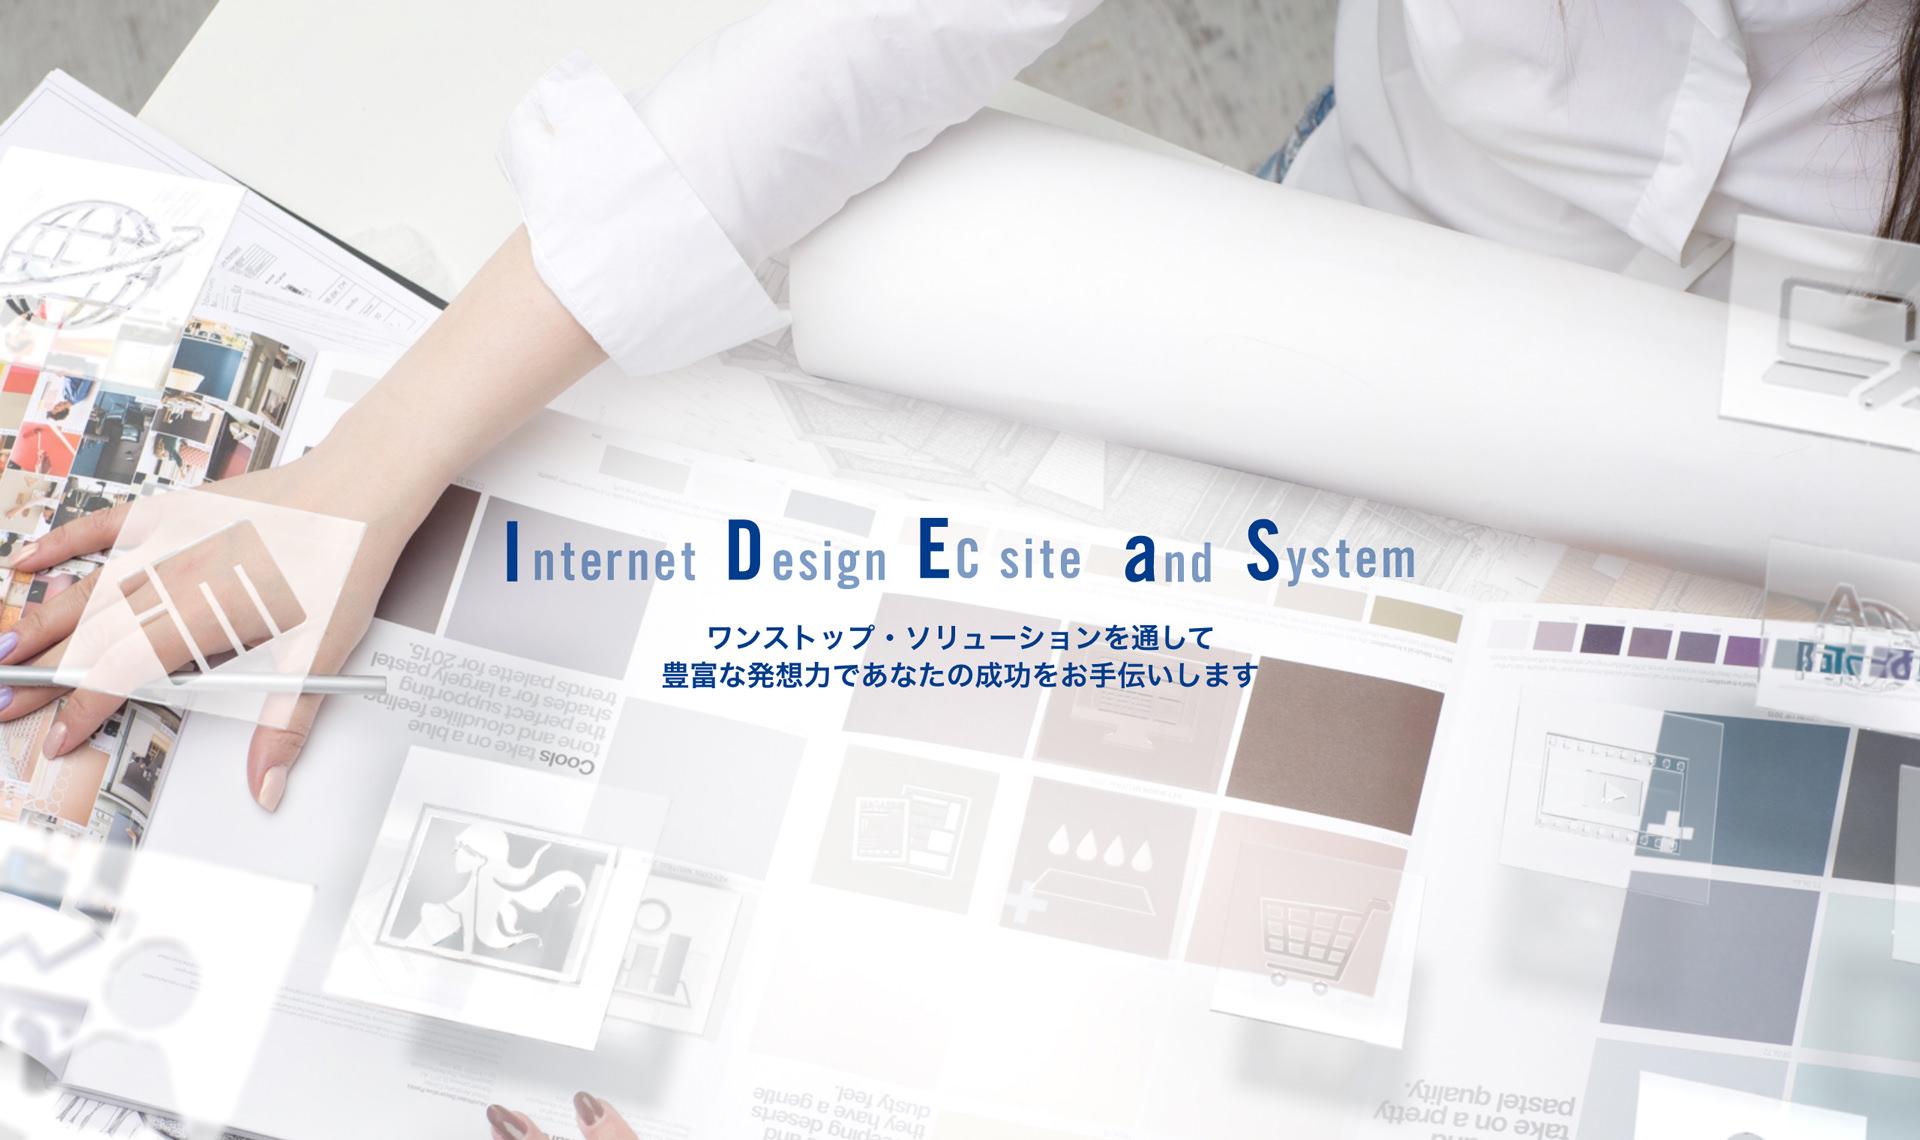 Iuternet Design Ec site and System ワンストップ・ソリューションを通して豊富な発想力であなたの成功をお手伝いします